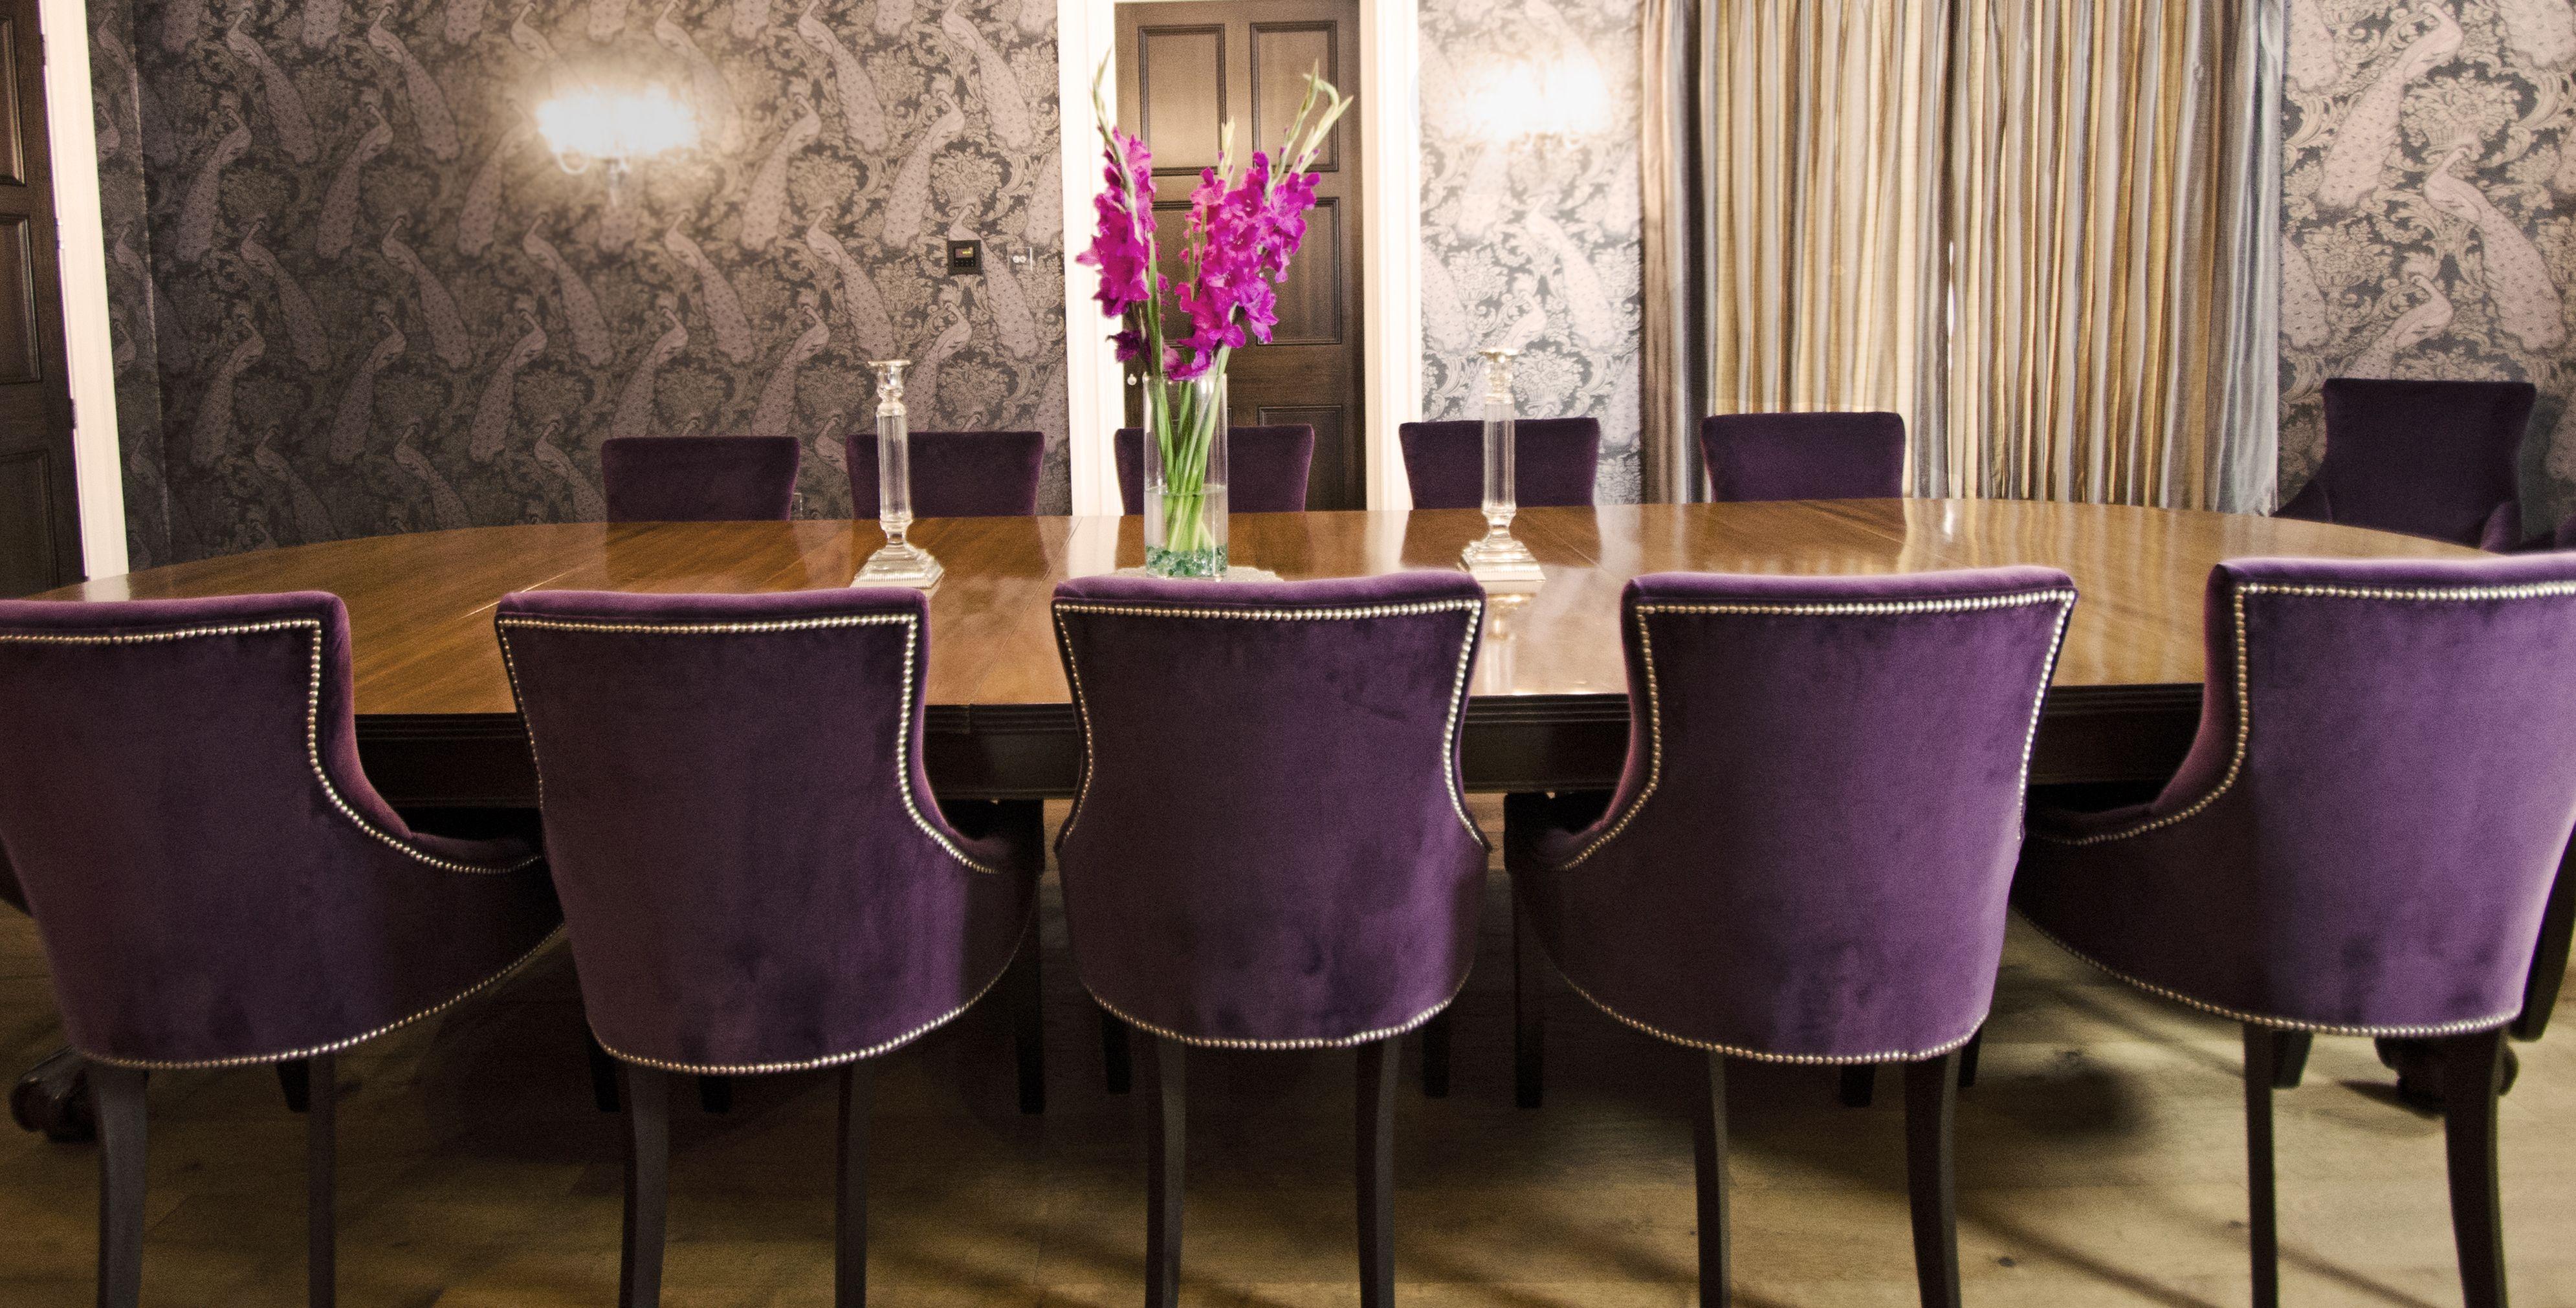 Velvet Purple Dining Room Chairs Www Suescammellinteriors Co Uk